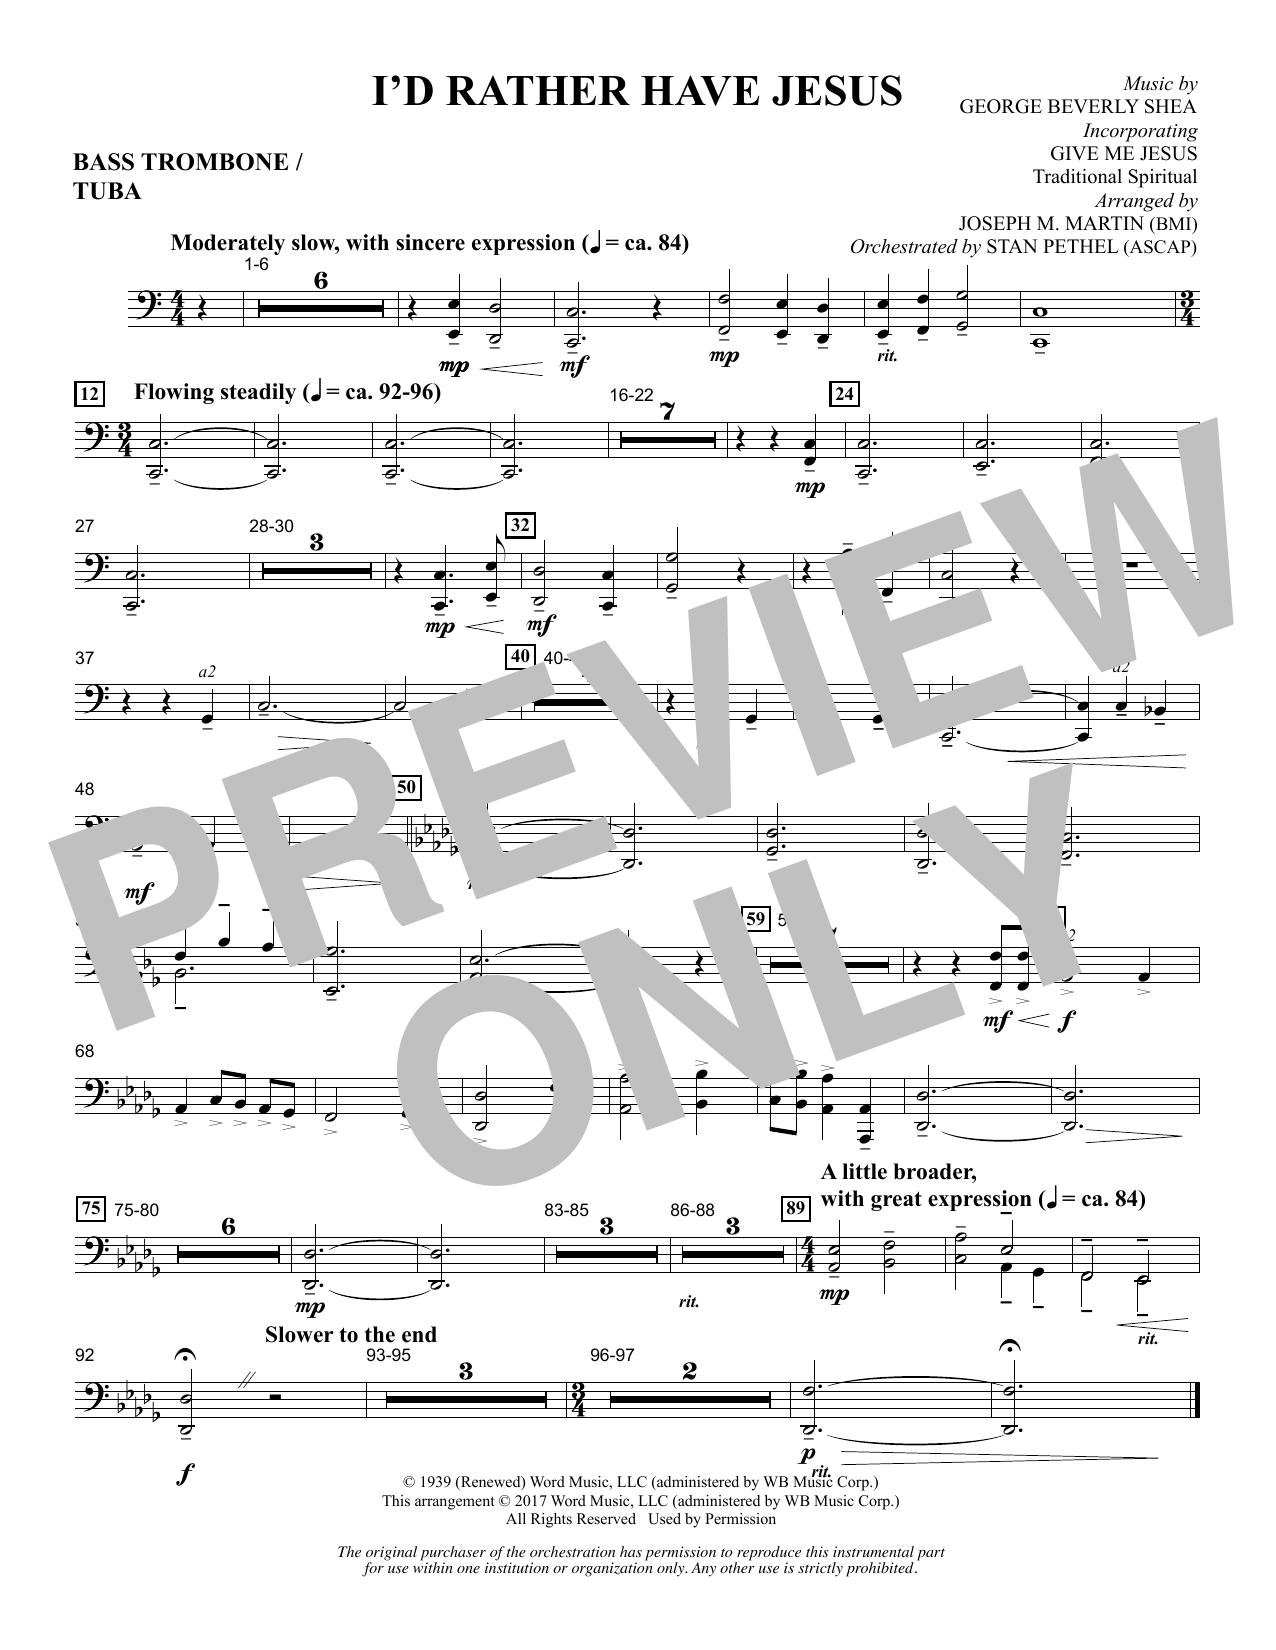 Joseph M. Martin I'd Rather Have Jesus - Bass Trombone/Tuba sheet music notes and chords. Download Printable PDF.